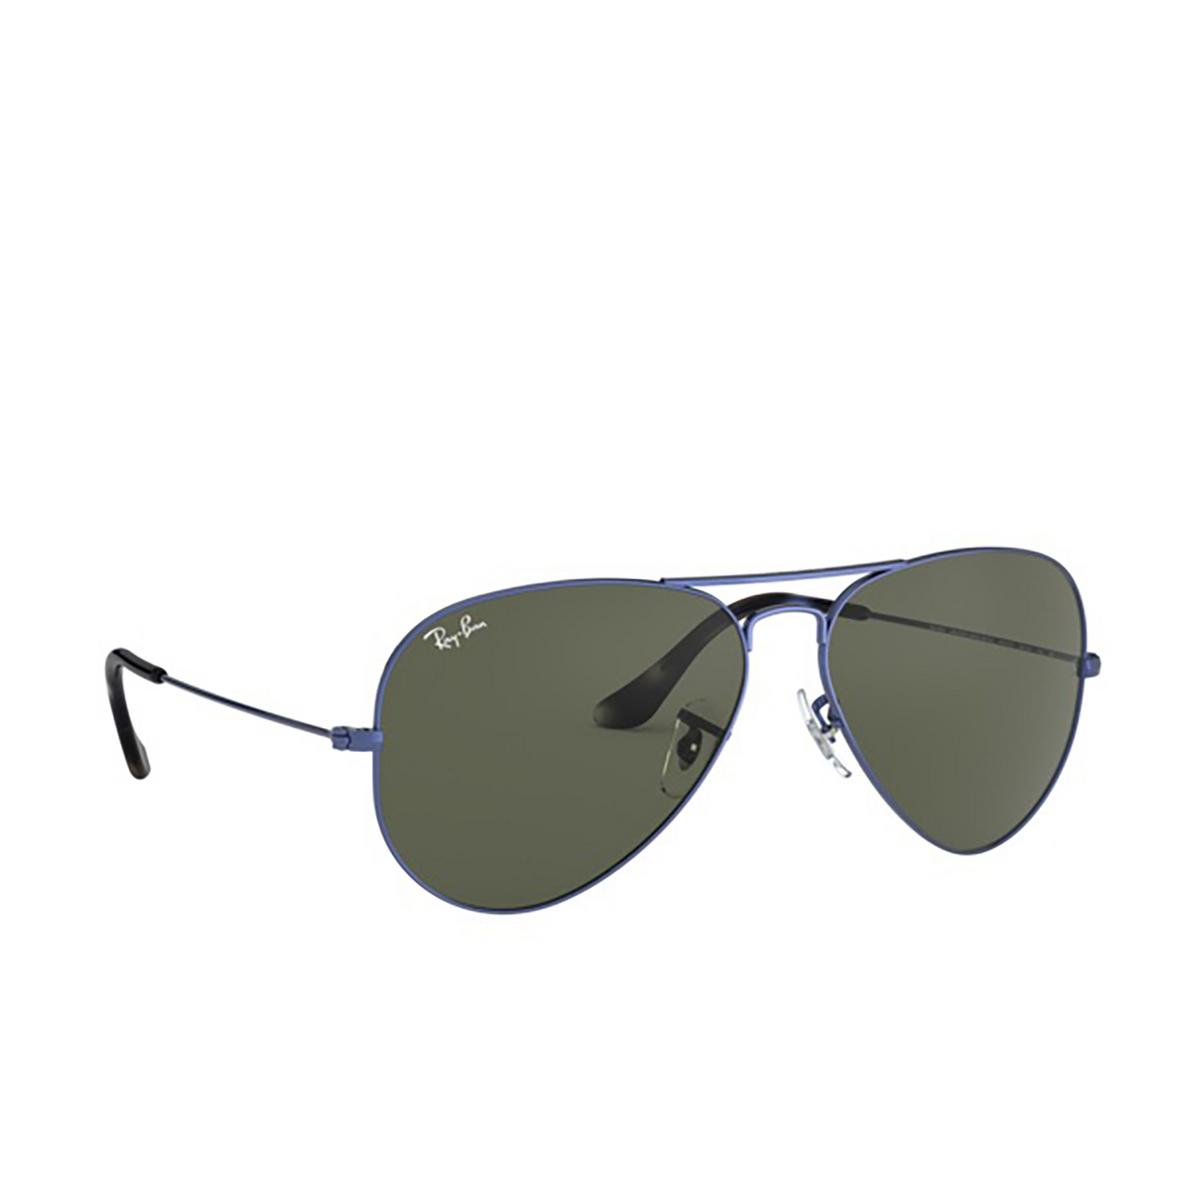 Ray-Ban® Aviator Sunglasses: Aviator Large Metal RB3025 color Sand Transparent Blue 918731 - three-quarters view.